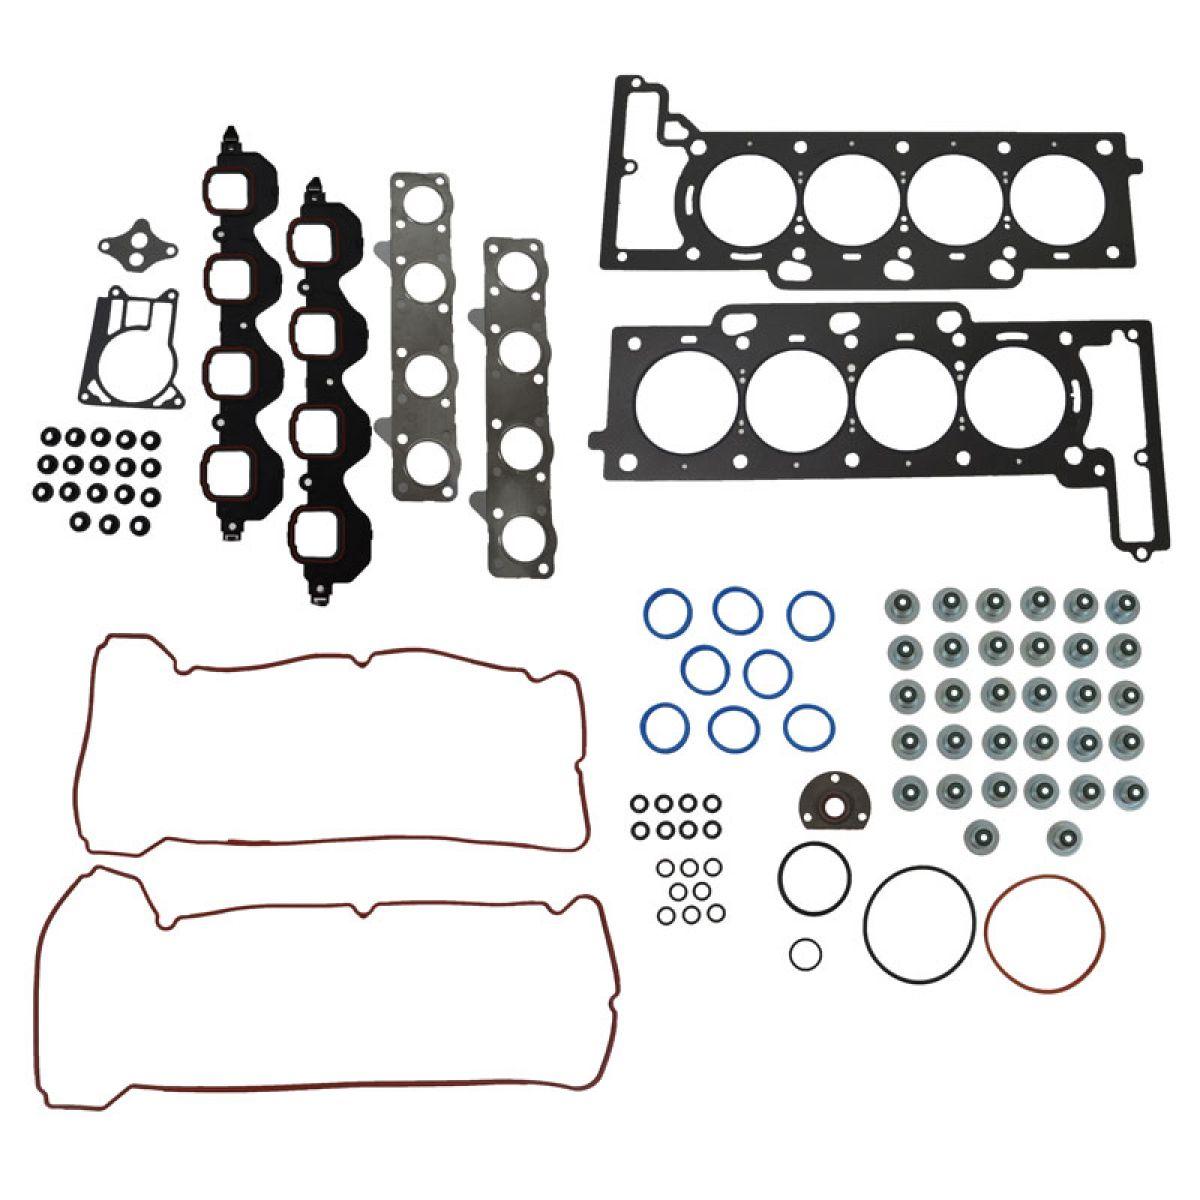 Engine Head Intake Exhaust Manifold Valve Cover Gasket Kit